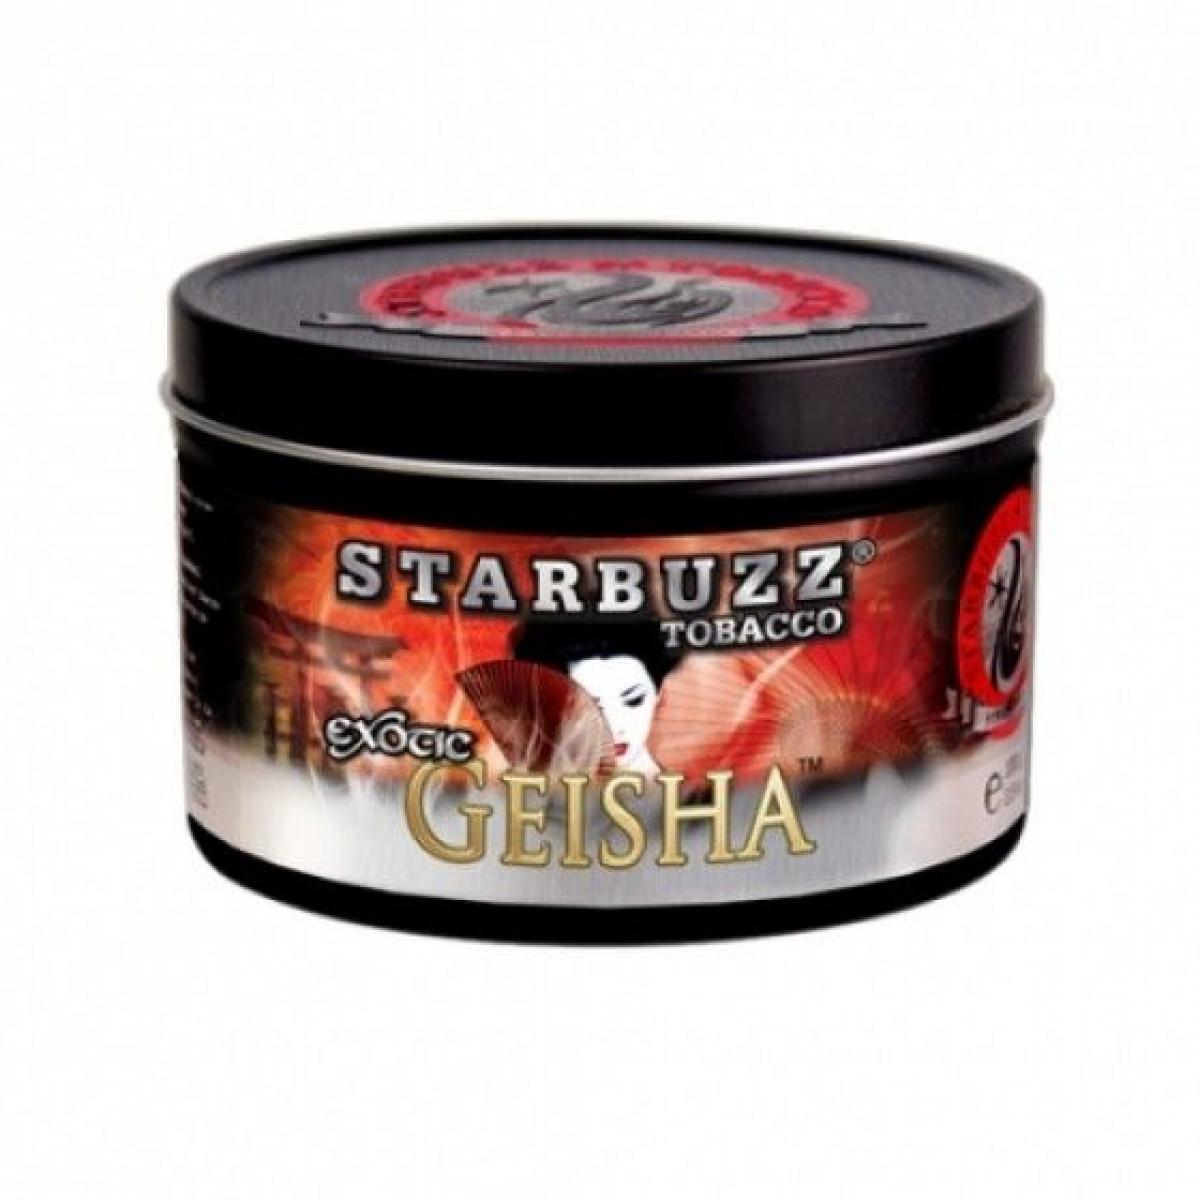 Табак Starbuzz Geisha (Старбазз Гейша) 250 грамм